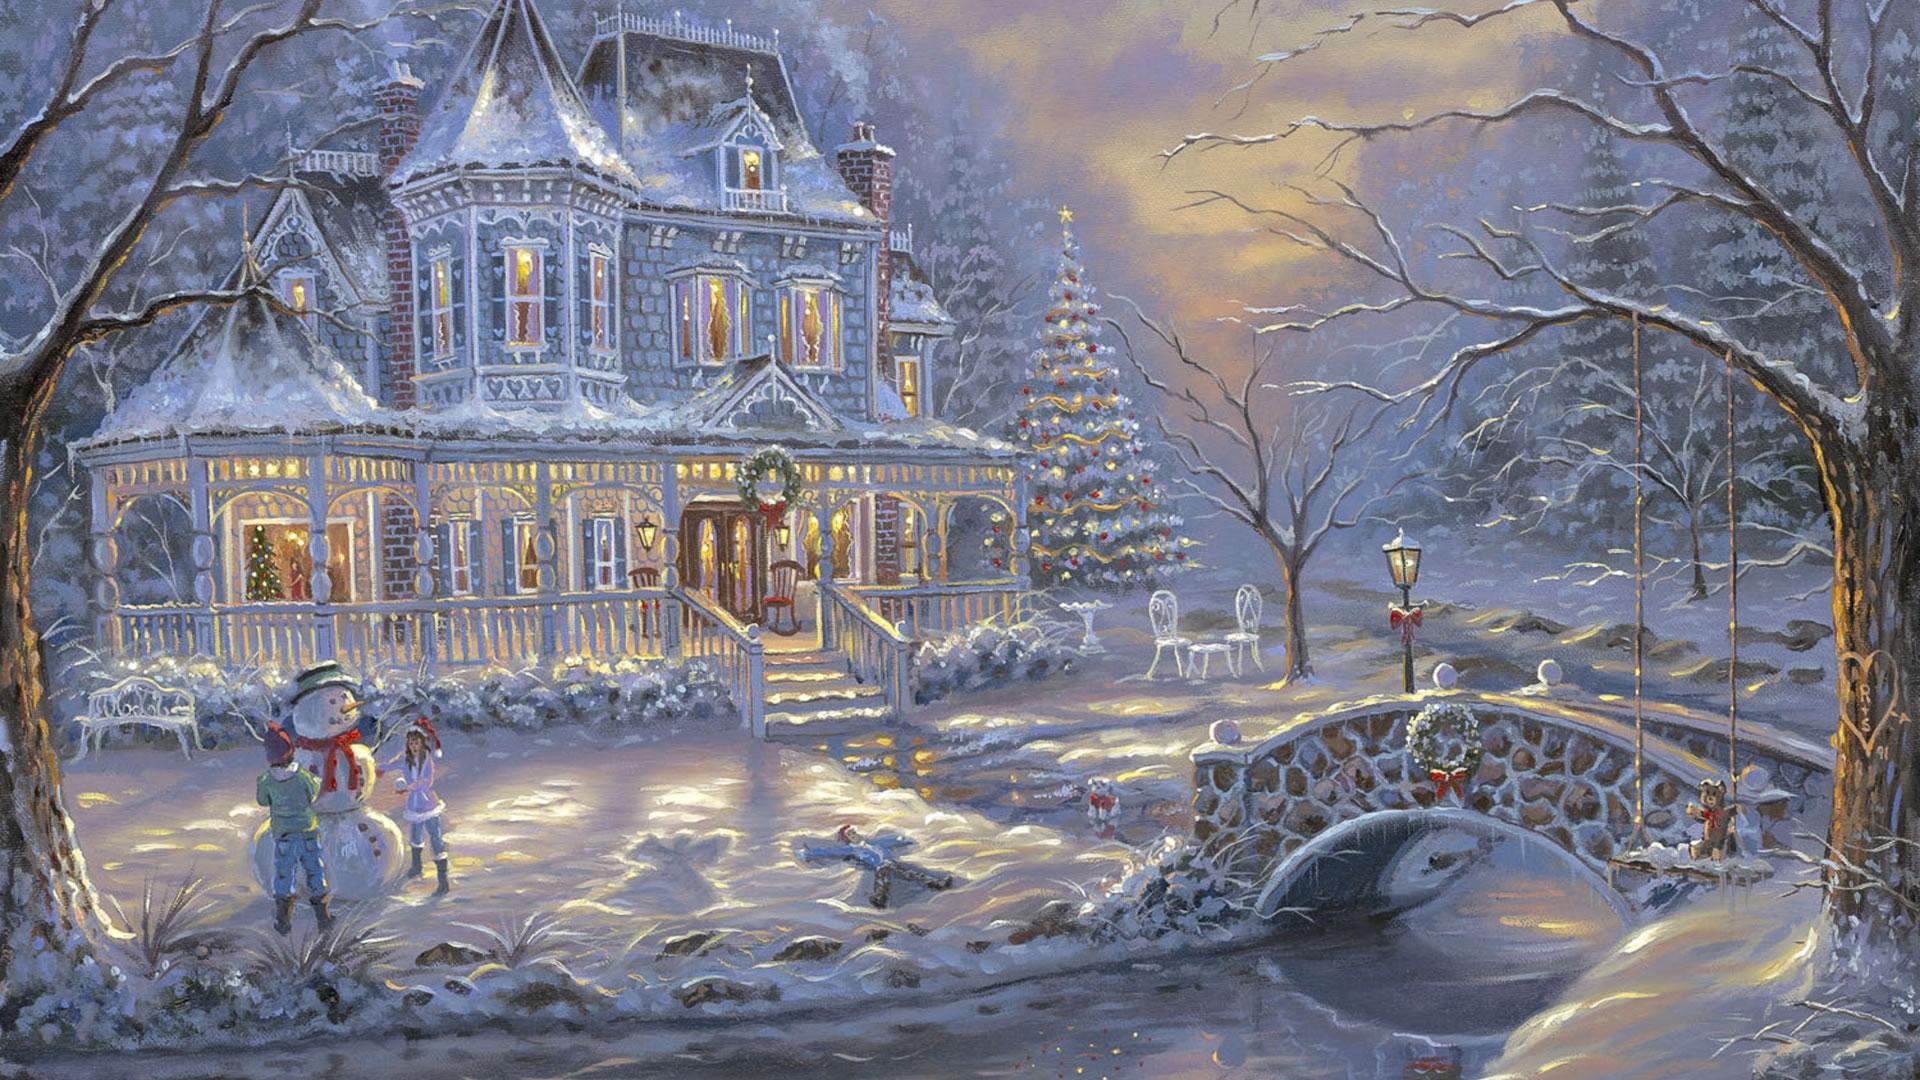 download wallpaper: een winters tafereeltje wallpaper